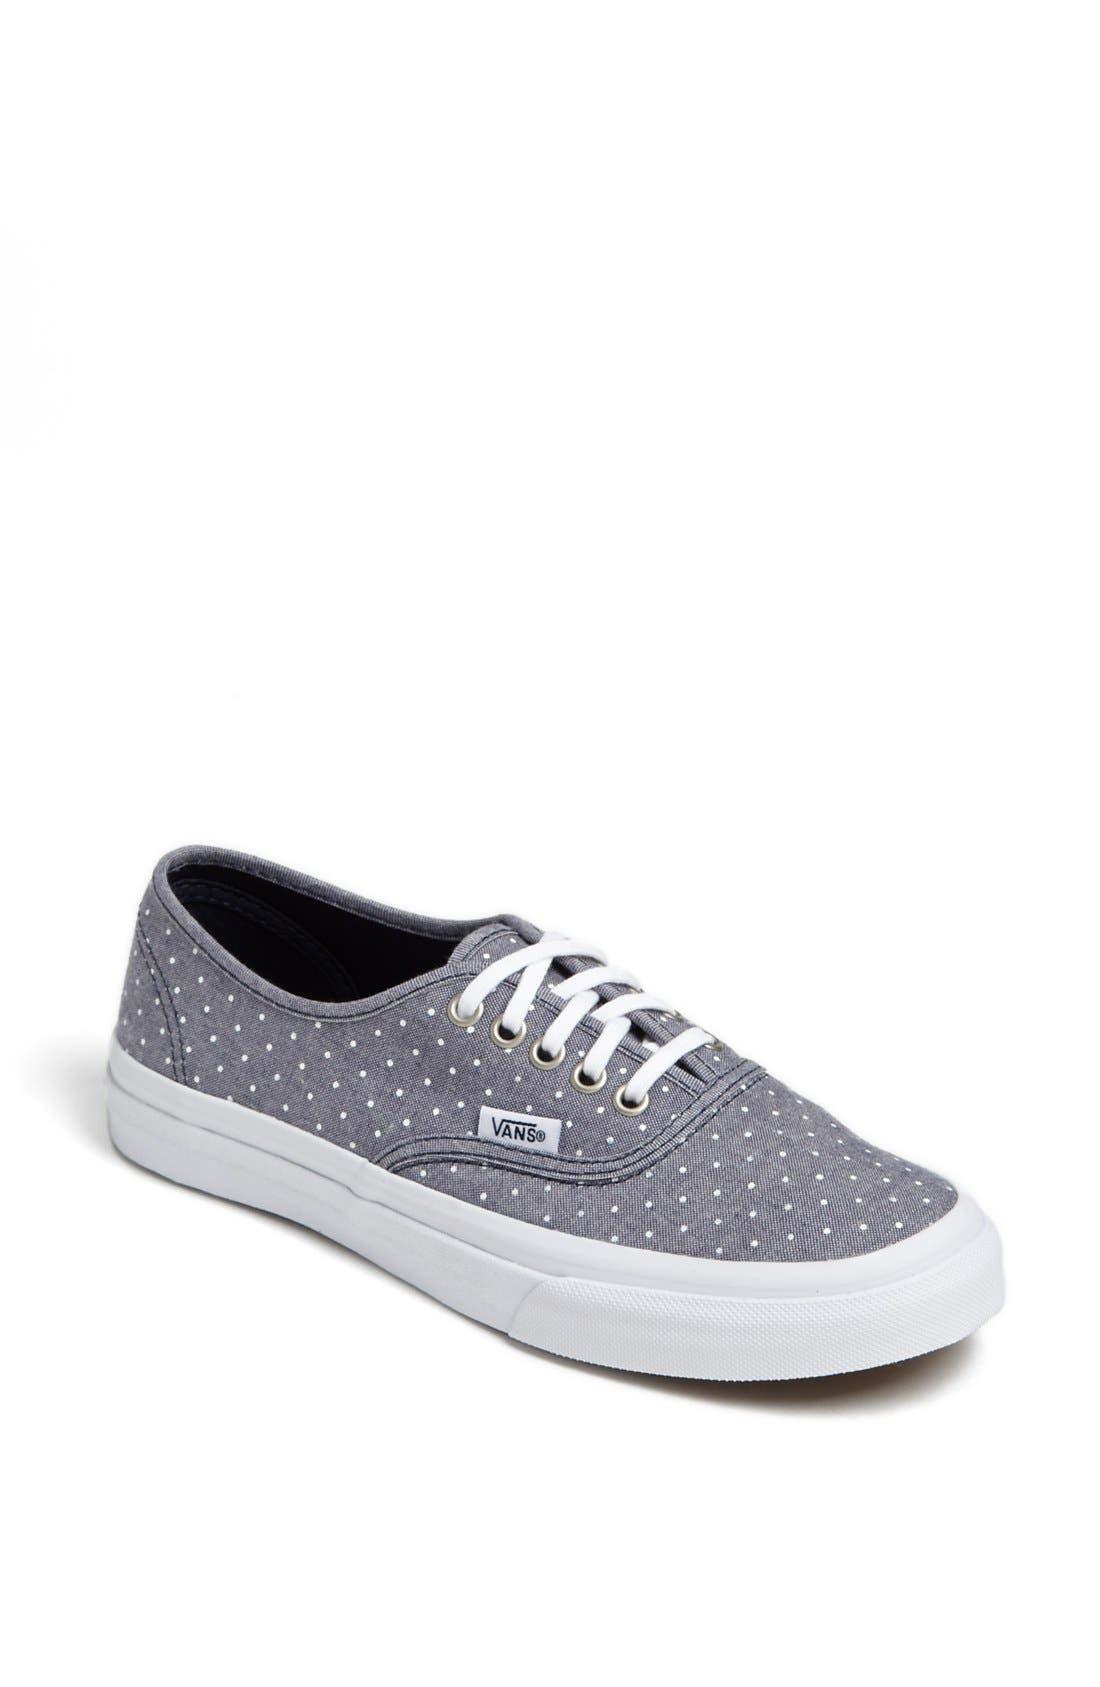 Main Image - Vans 'Authentic - Slim' Polka Dot Sneaker (Women)